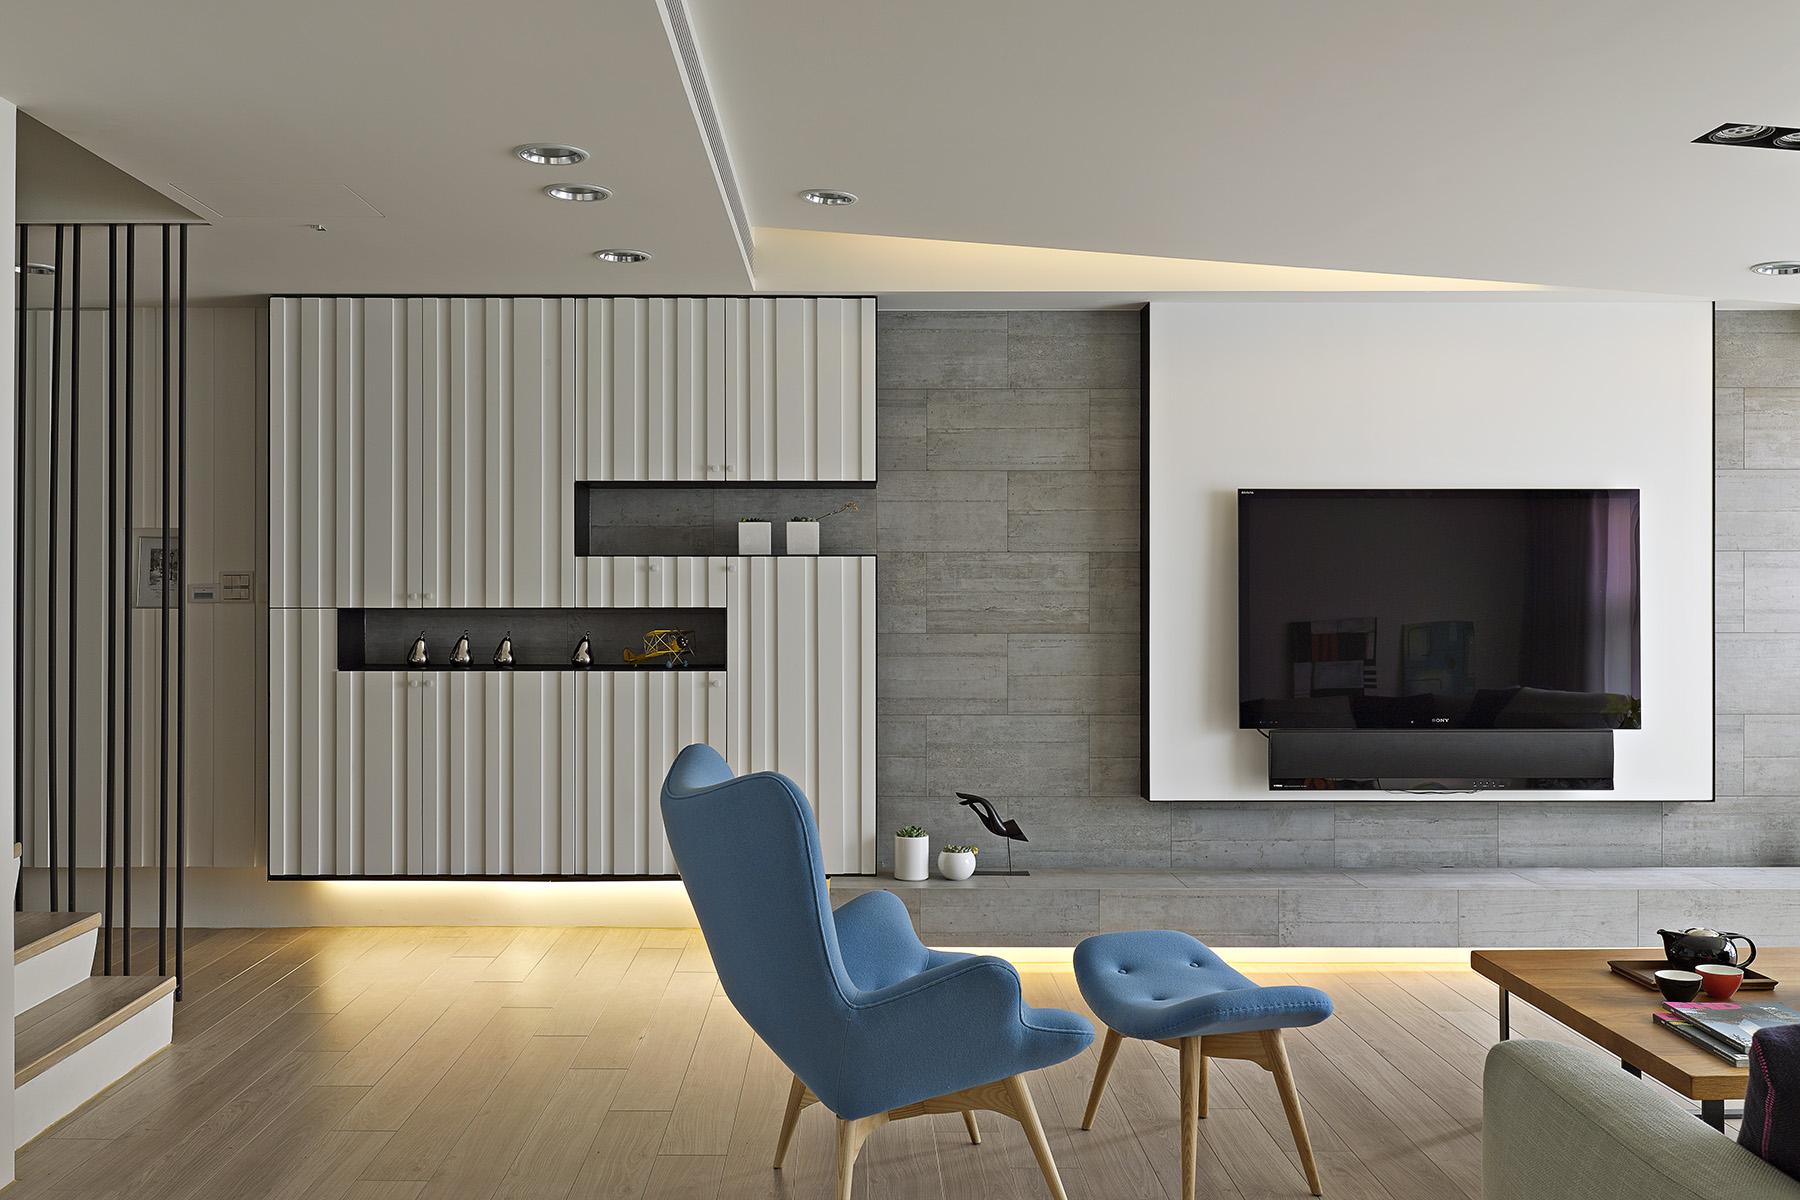 modern ceiling design for small living room decorating ideas australia 2 beautifully minimalist asian designs